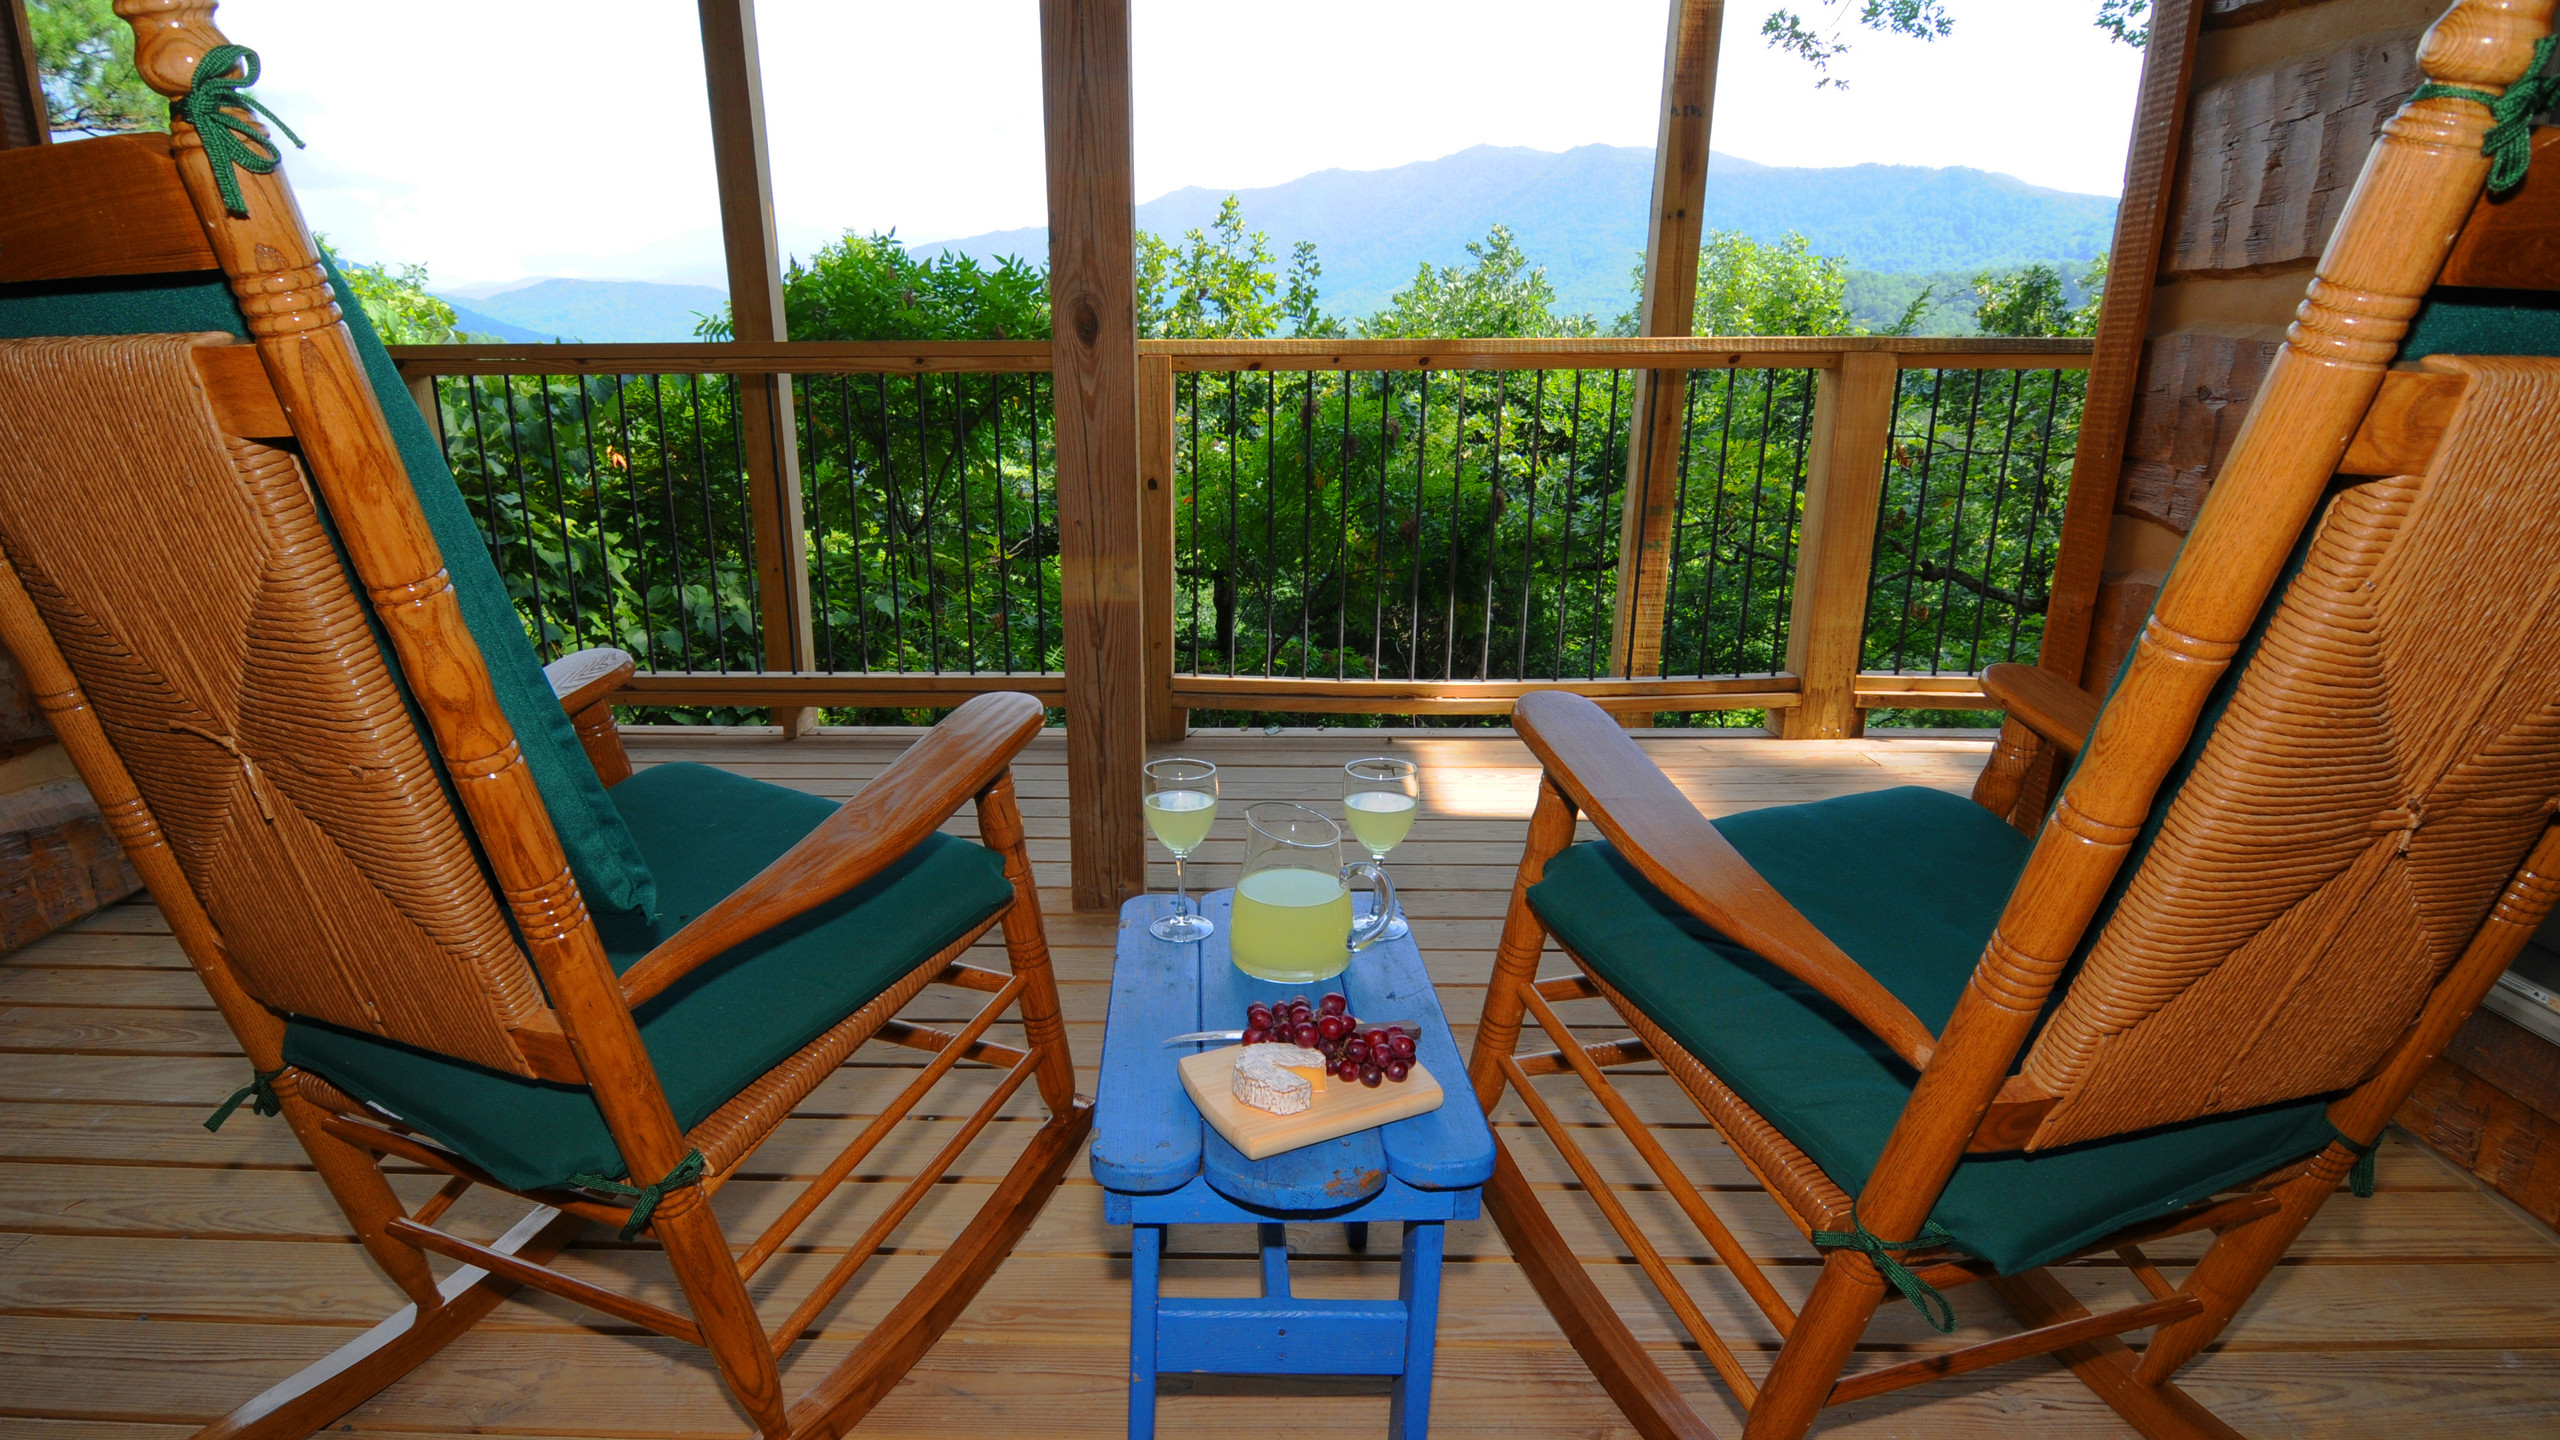 Raw00156_Rocking Chairs & Lemonade View